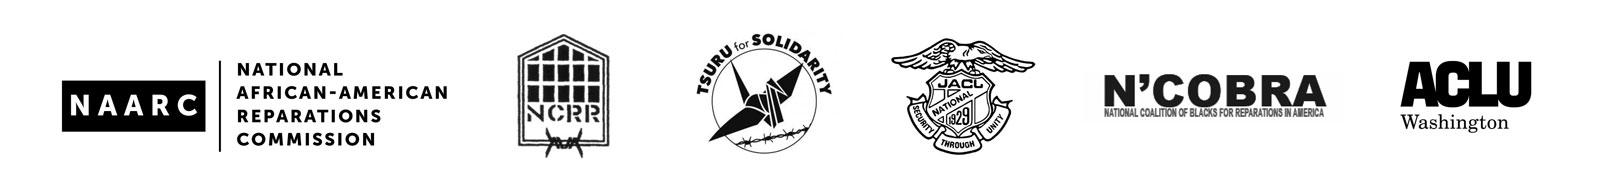 naarc, ncrr, tsuru for solidarity, jacl, ncobra, and aclu